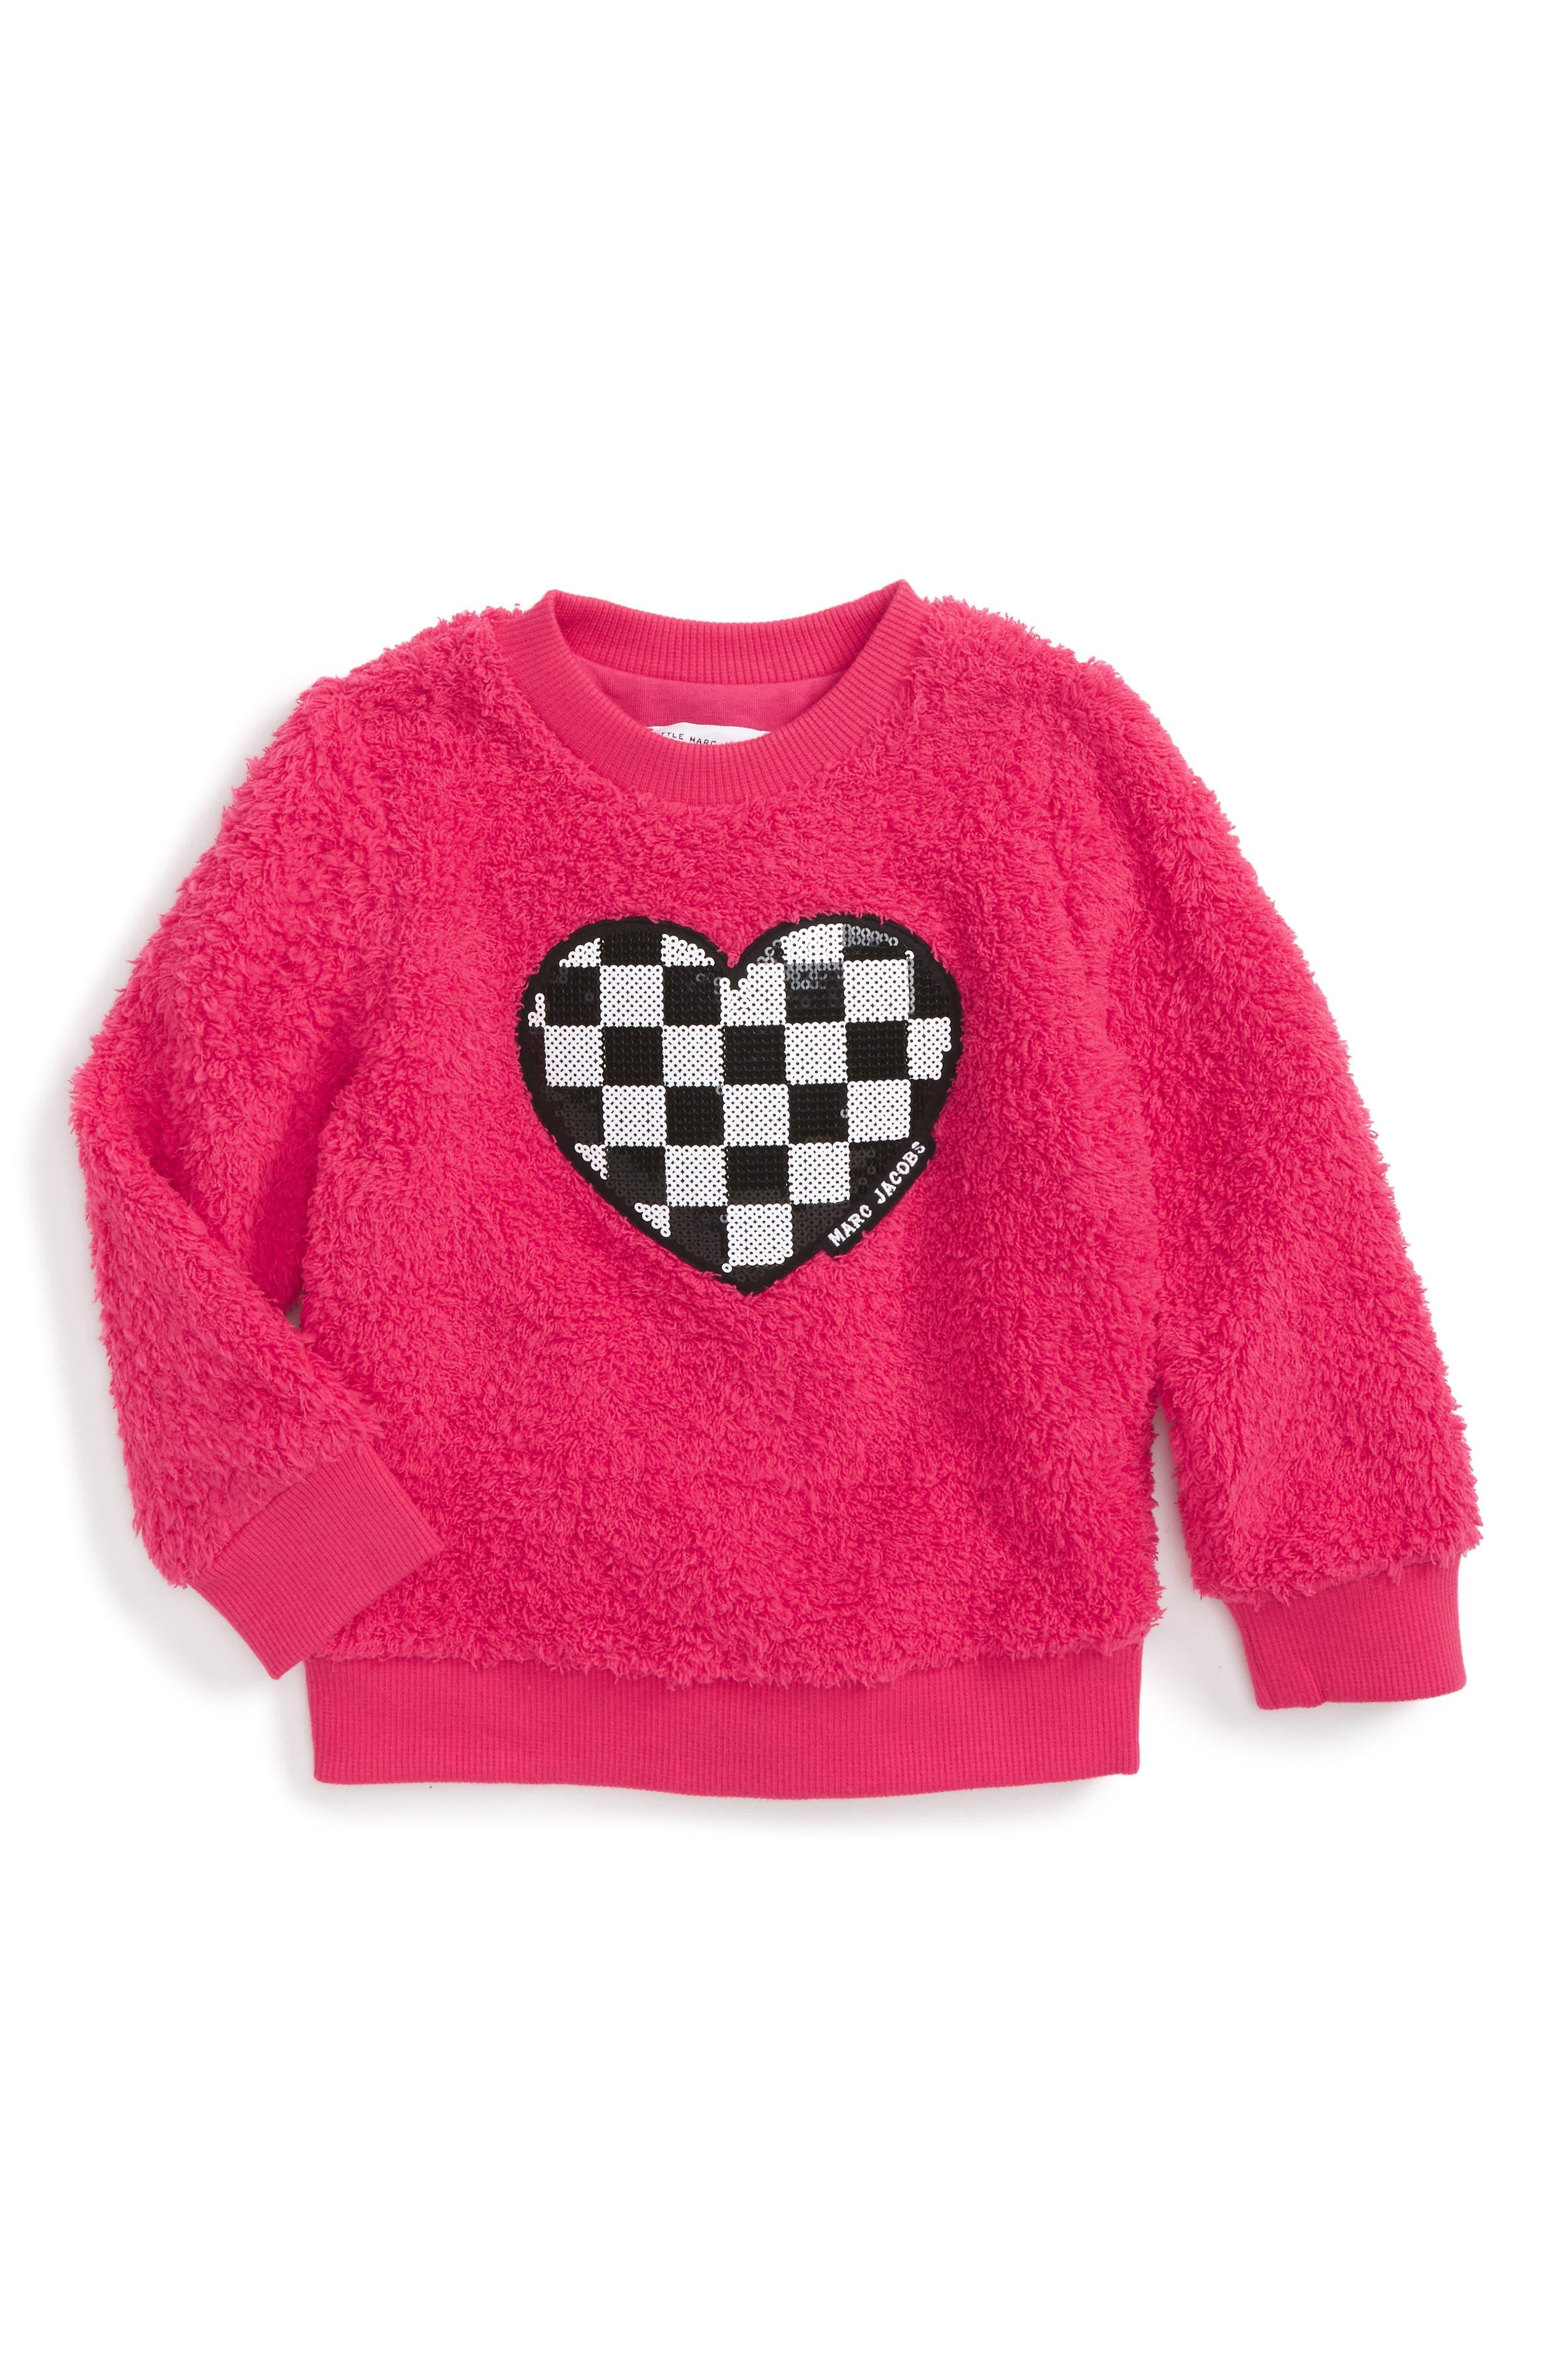 Main Image - LITTLE MARC JACOBS Sequin Heart Fuzzy Sweatshirt (Toddler Girls, Little Girls & Big Girls)